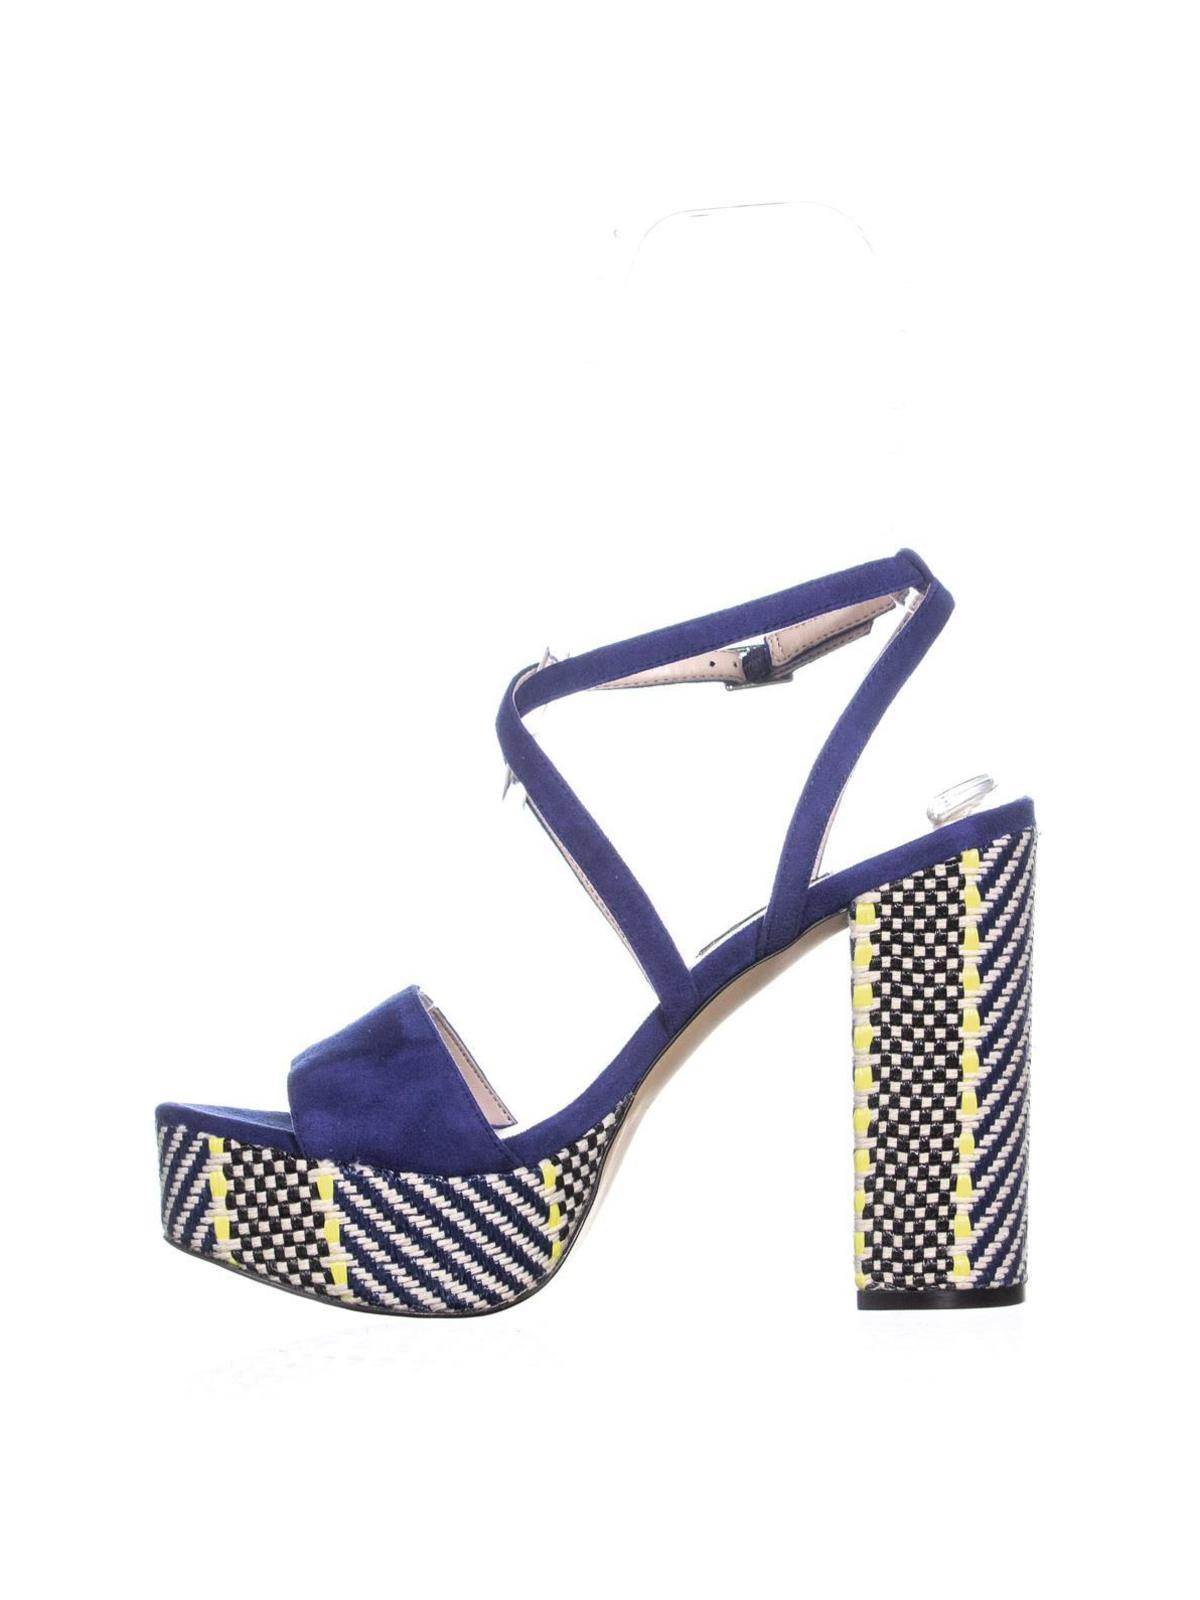 6c2477f0419 Nine West Markando Block Heel Platform Strappy Sandals